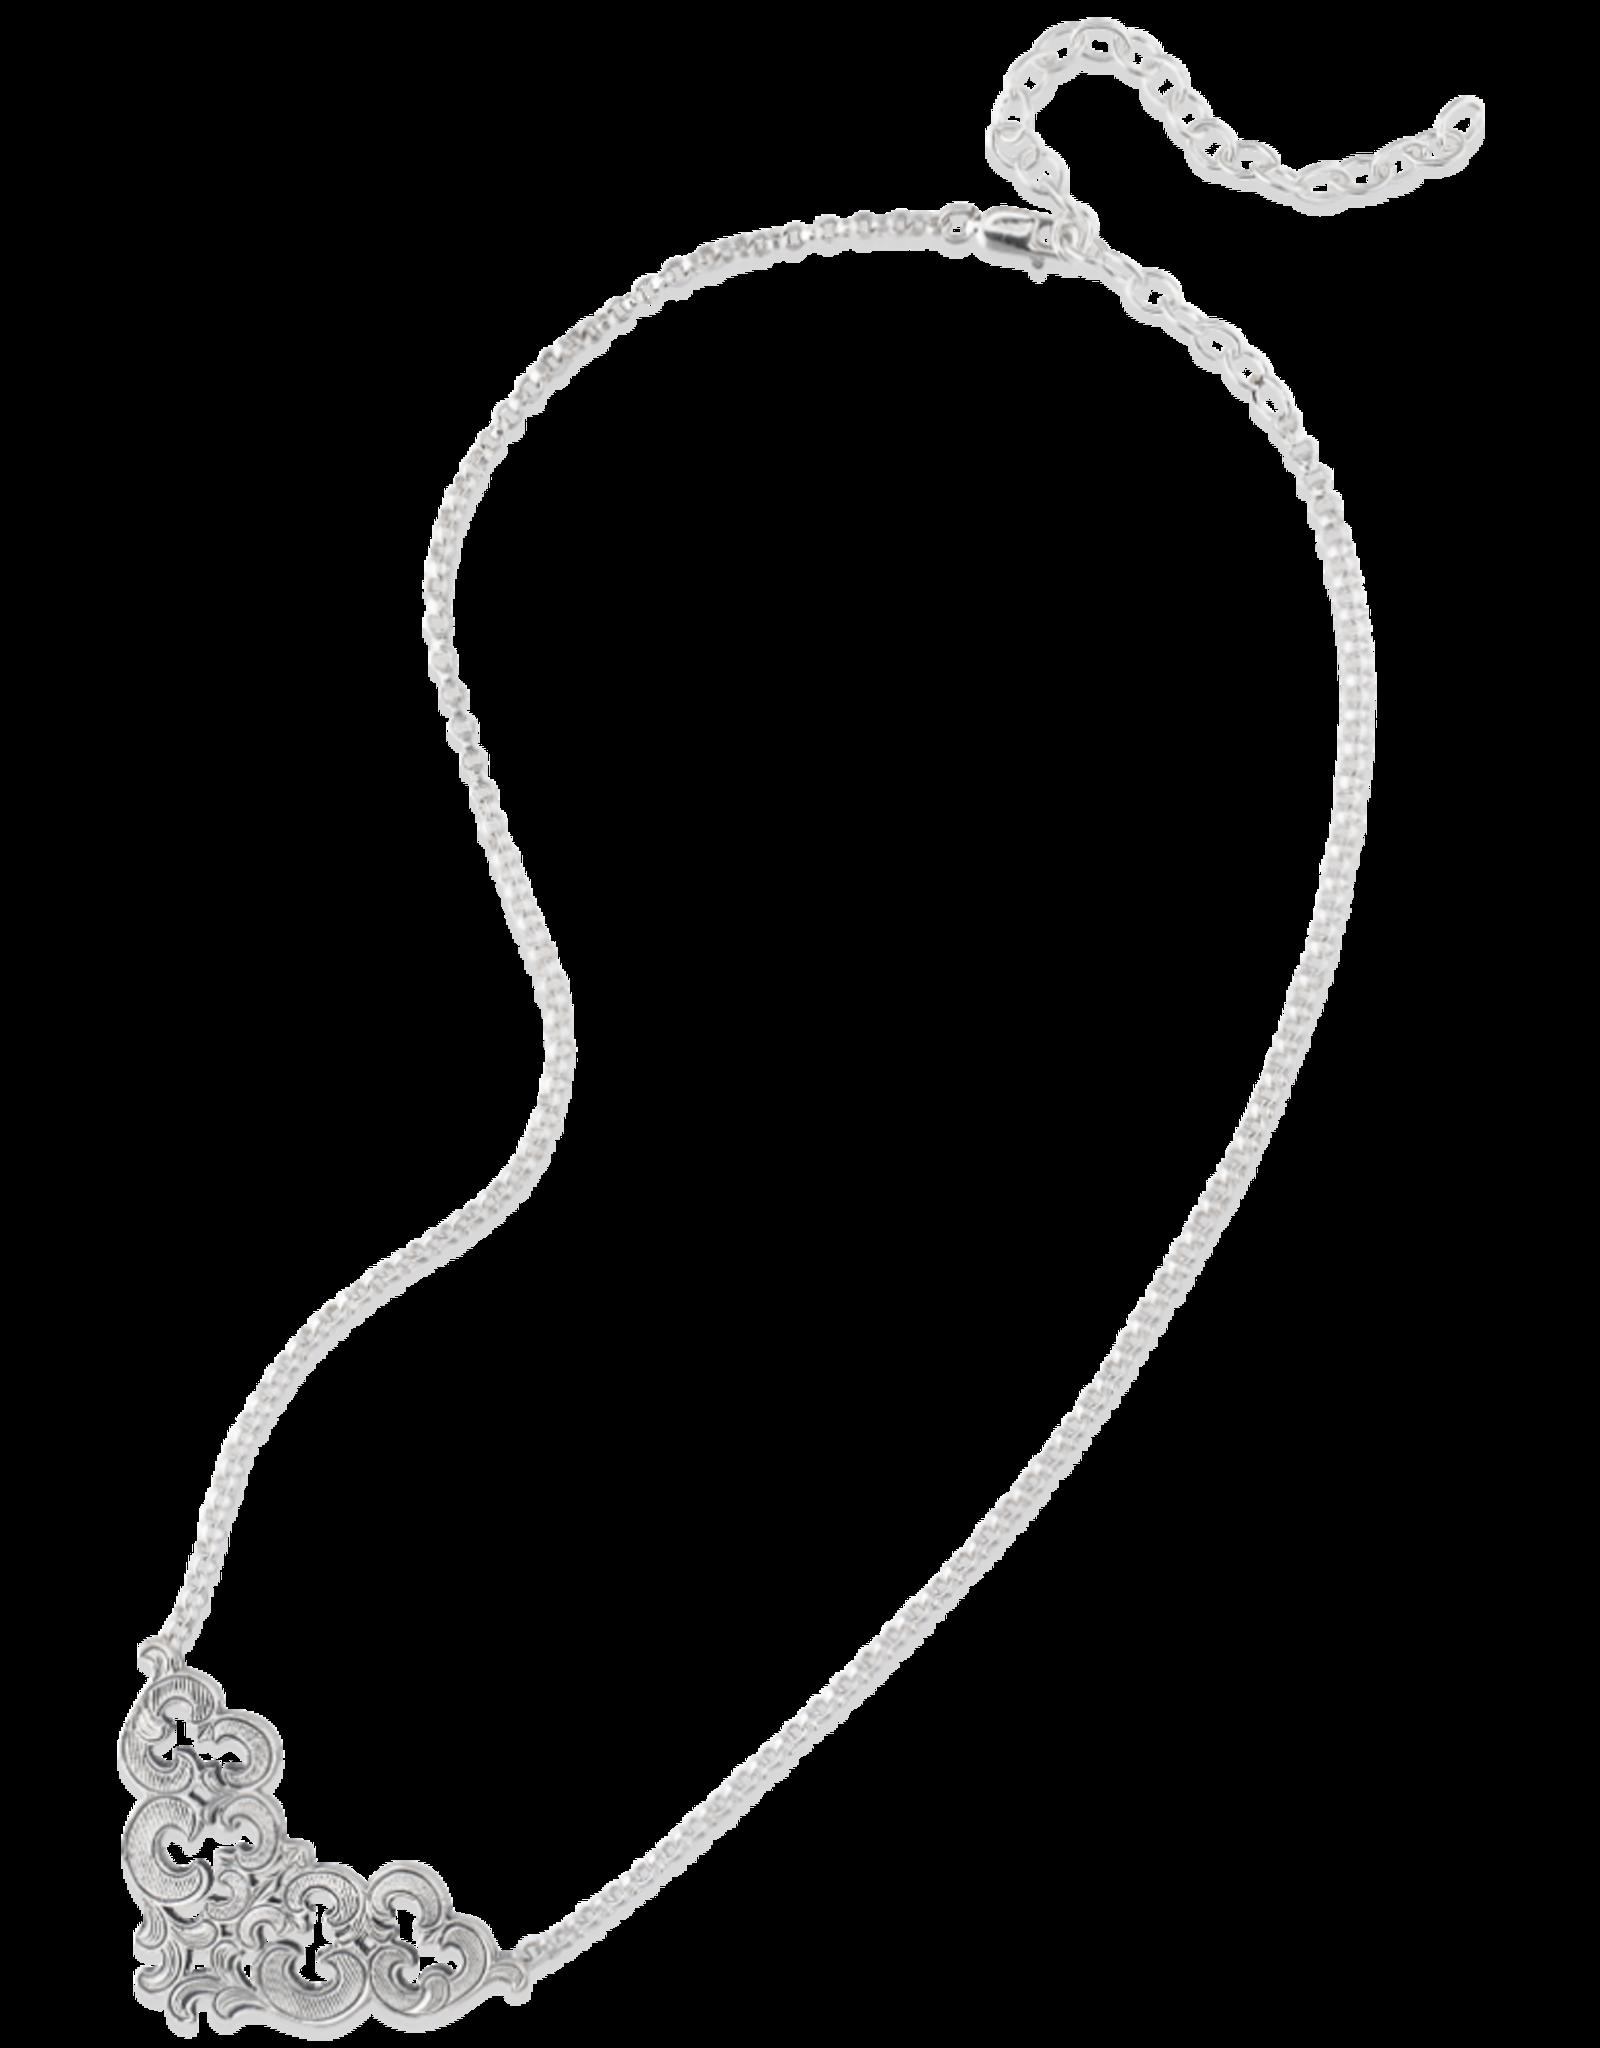 Mignon Faget Scrollwork Necklace